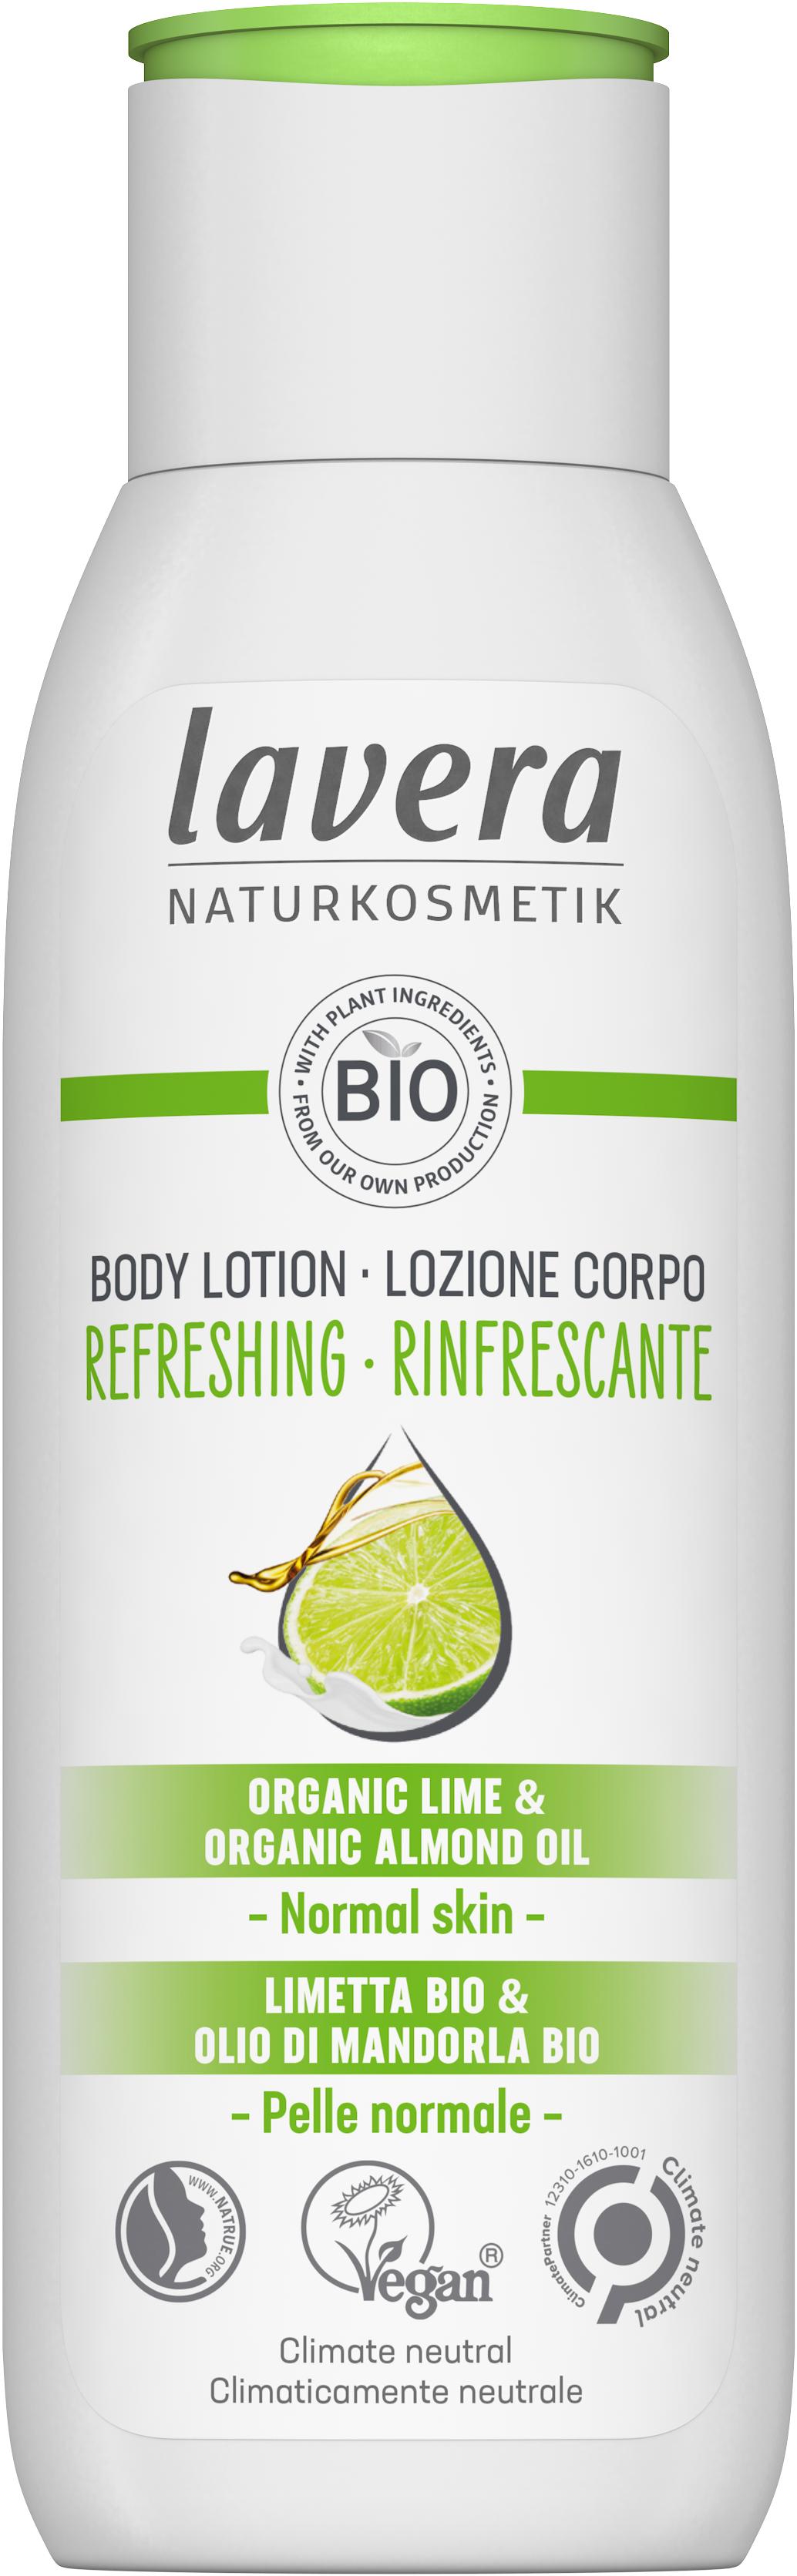 Body Lotion Refreshing